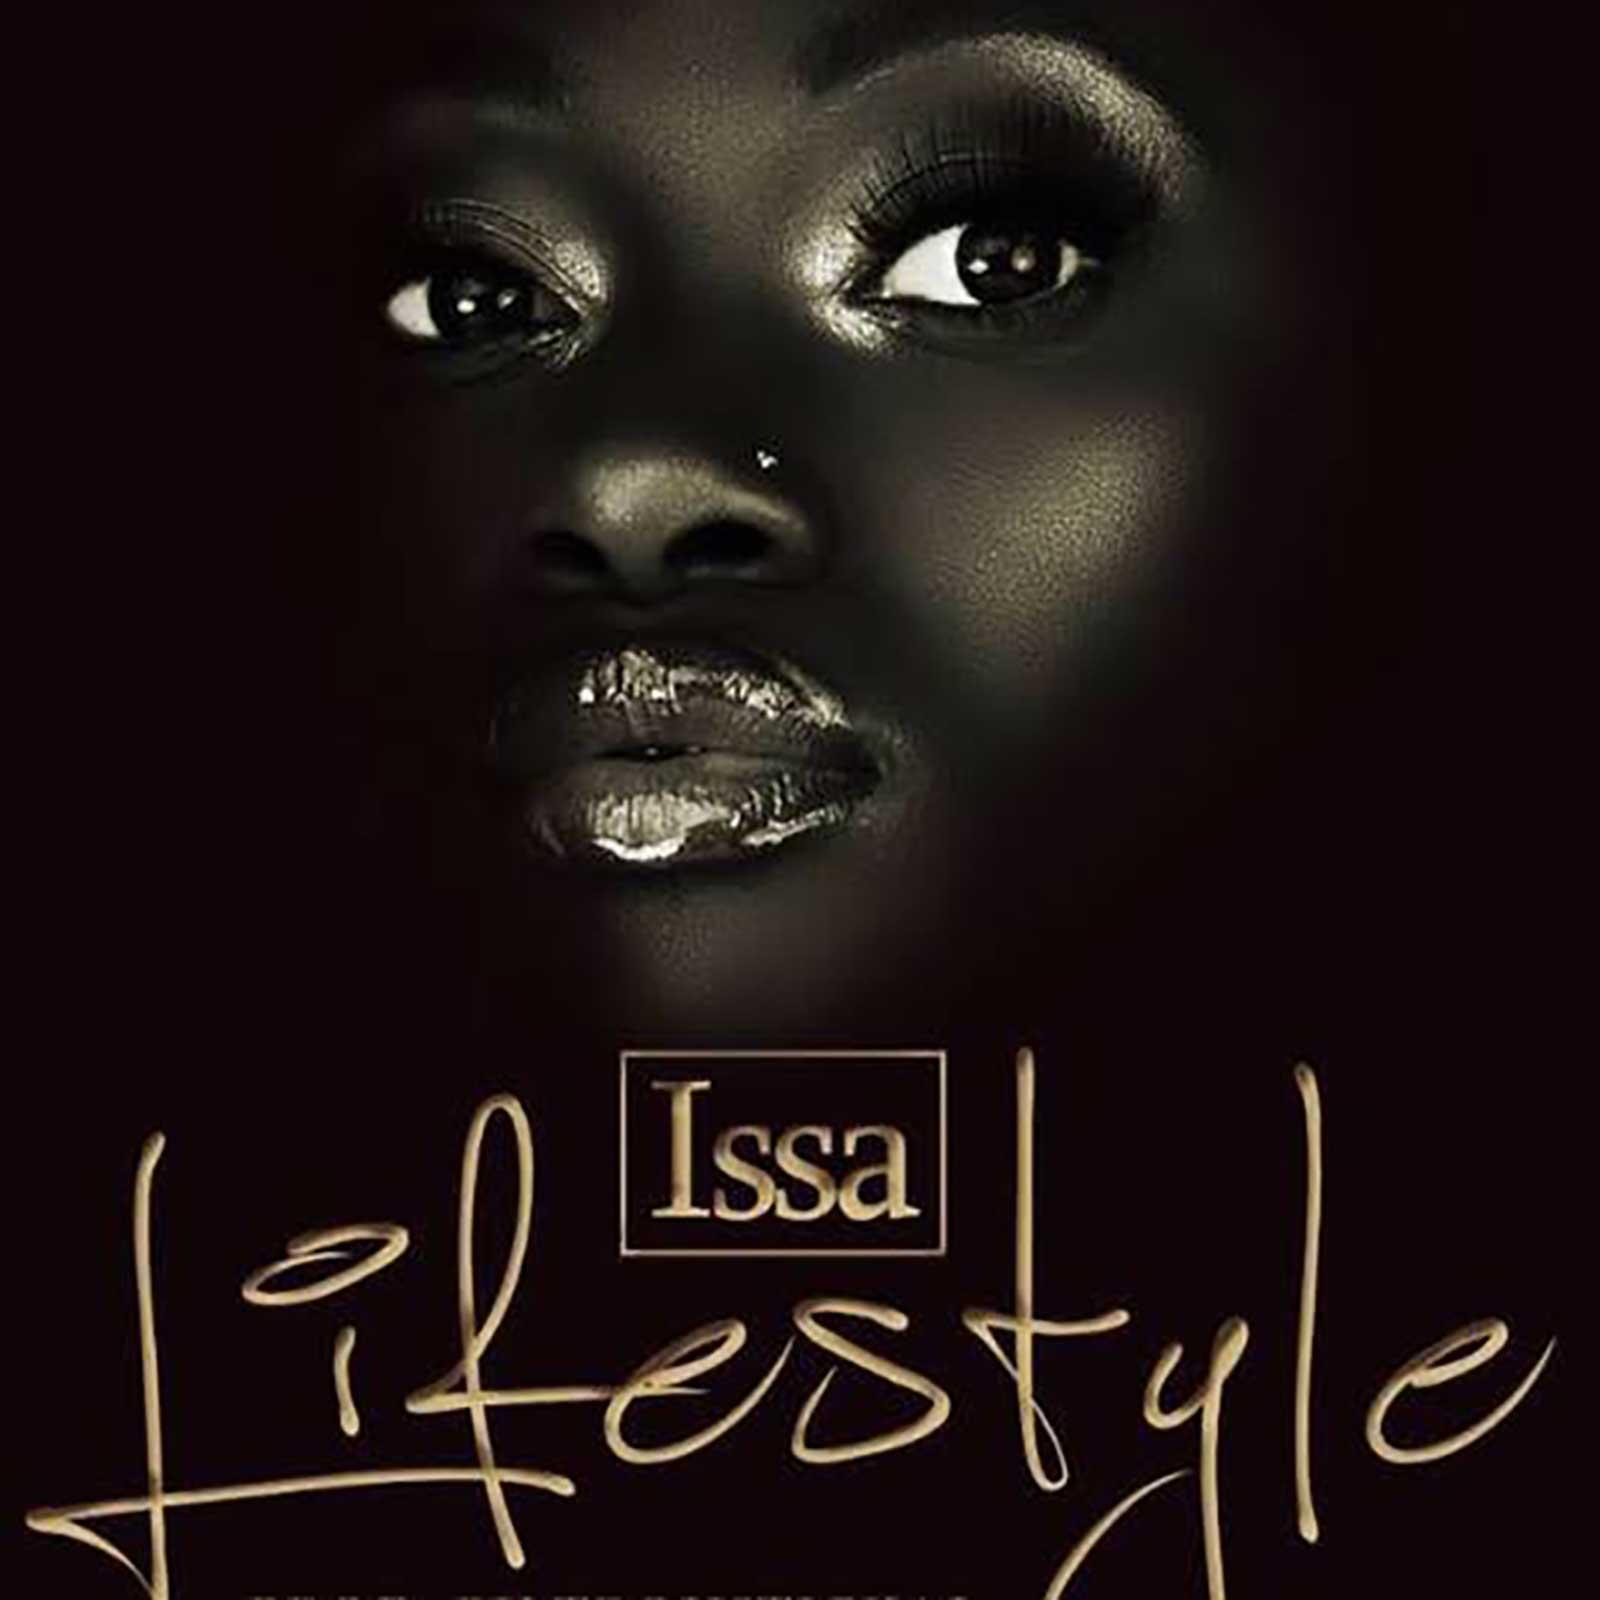 Issa Lifestlye by King Joe Versace x T-Wizzle